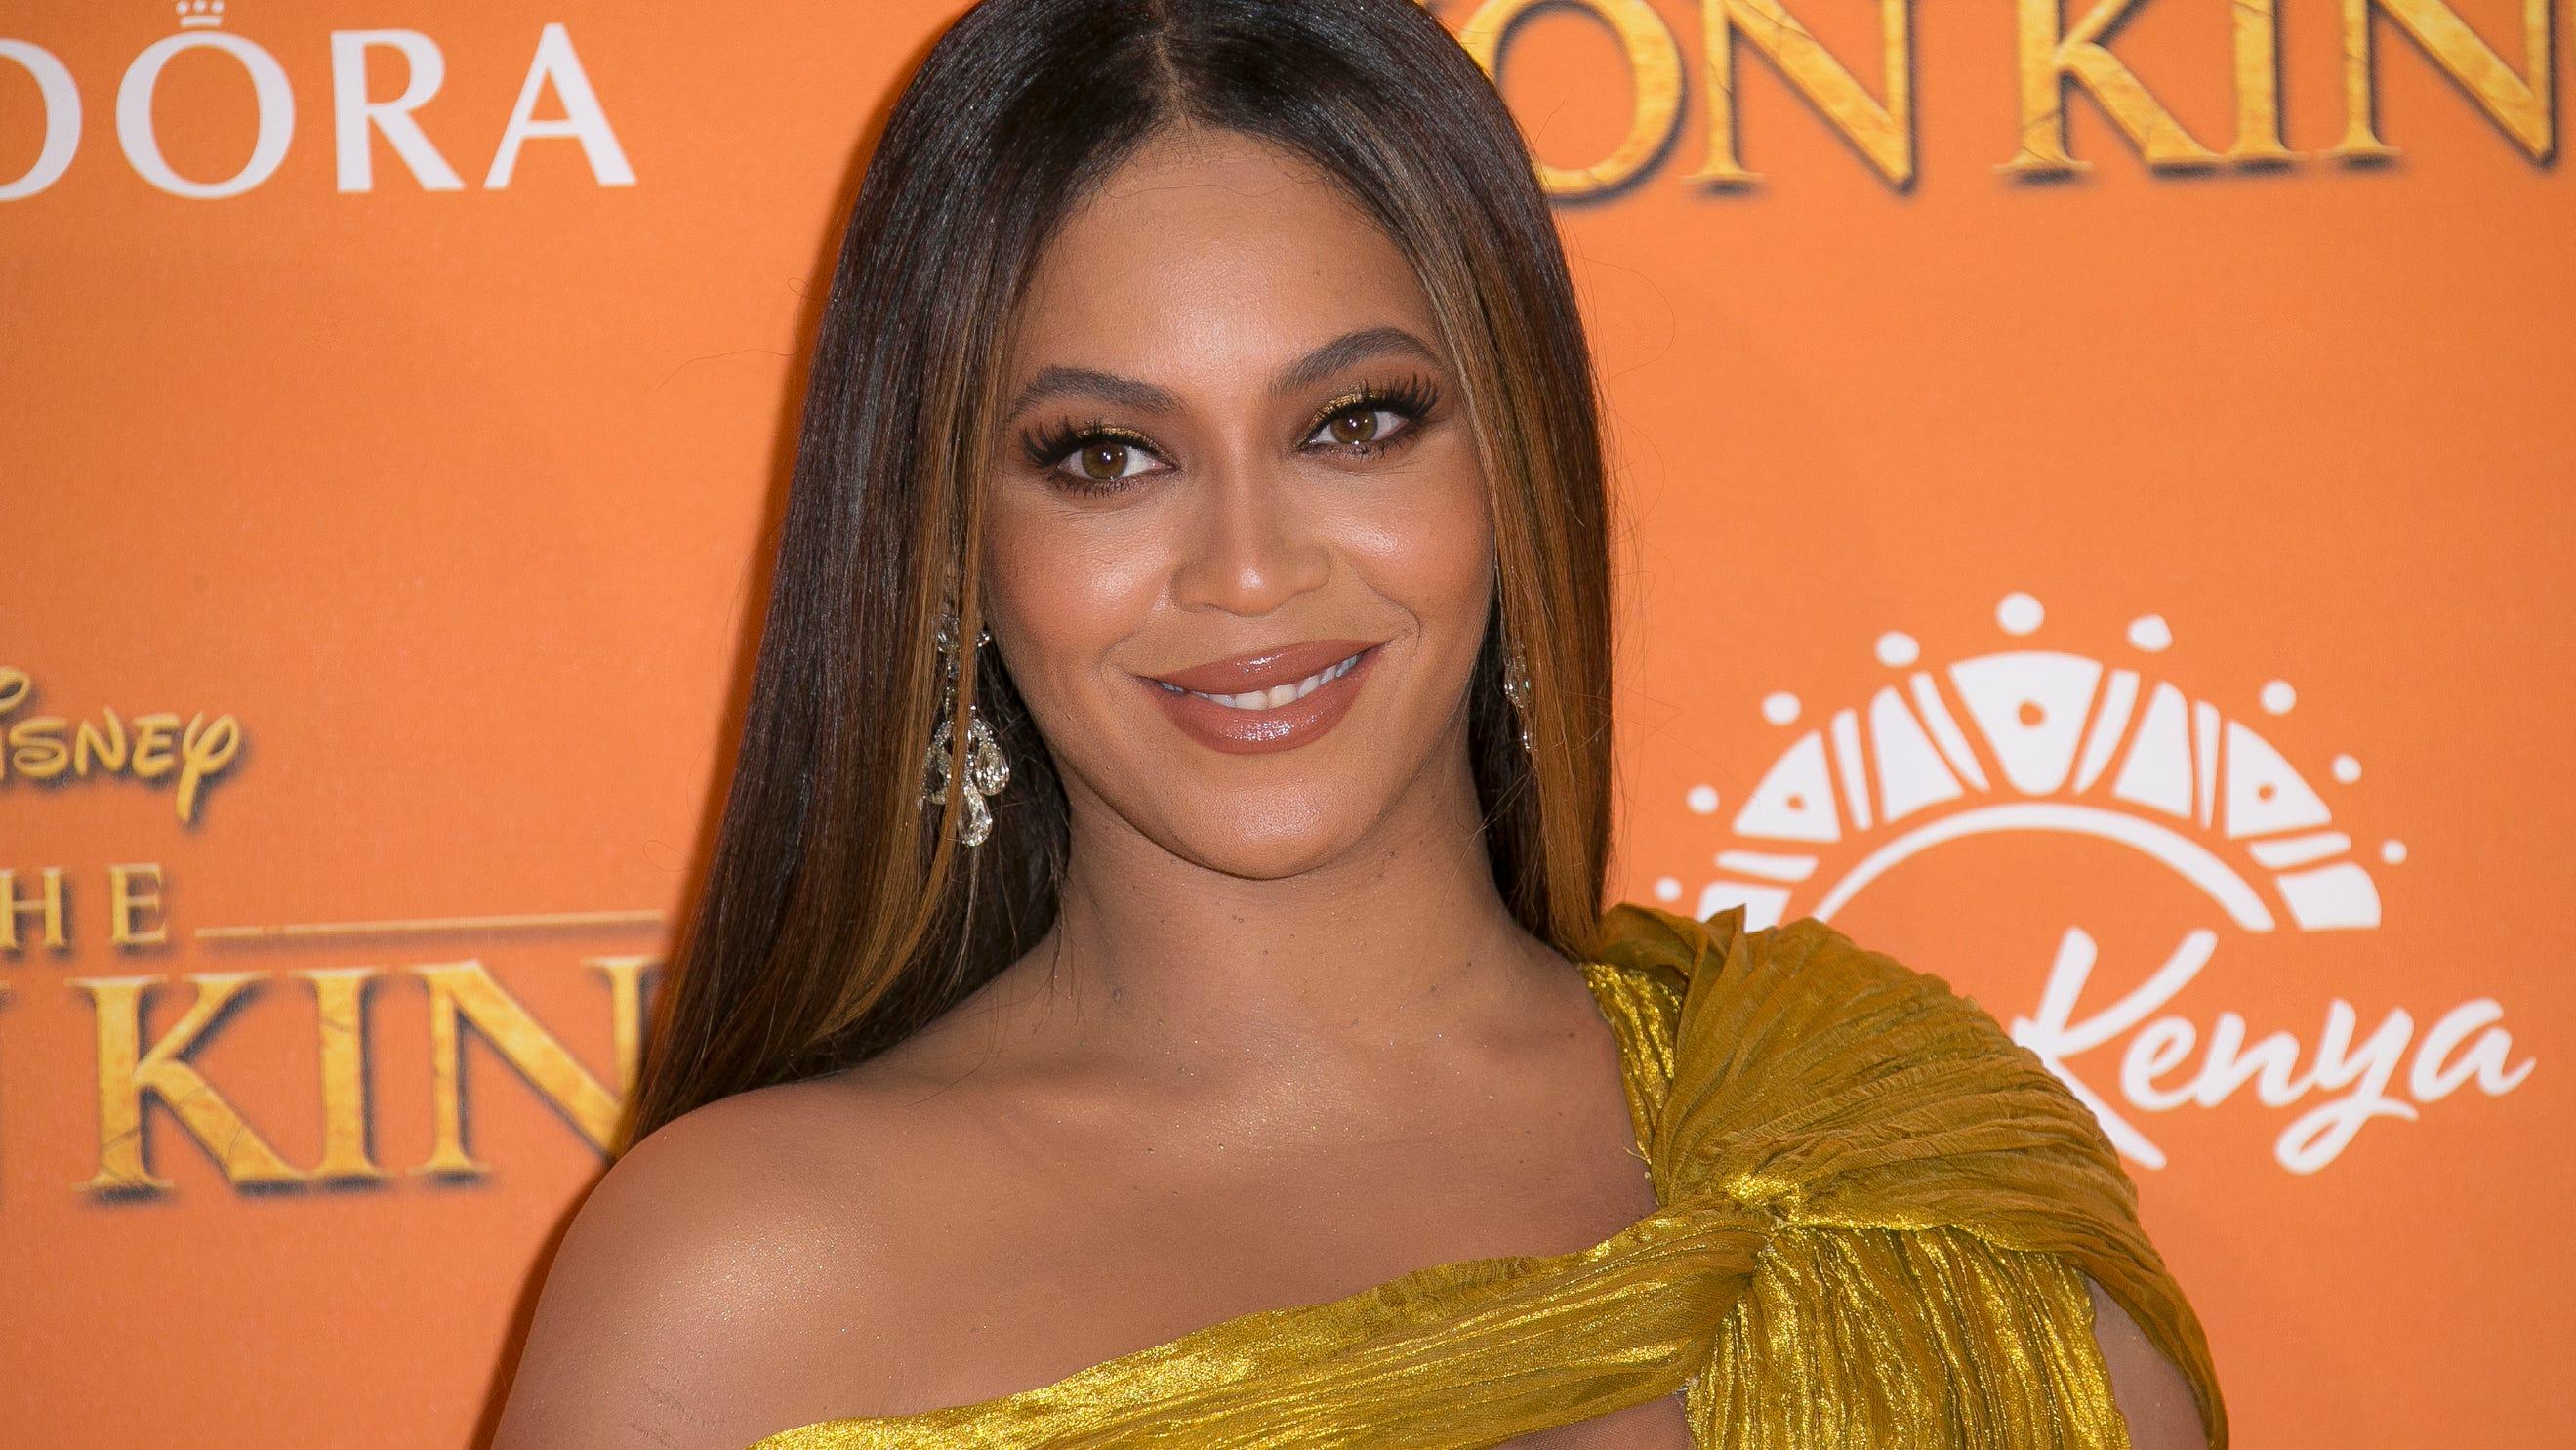 www.usatoday.com: Beyoncé leads Grammy nominations, Dua Lipa, Roddy Ricch and Taylor Swift score big